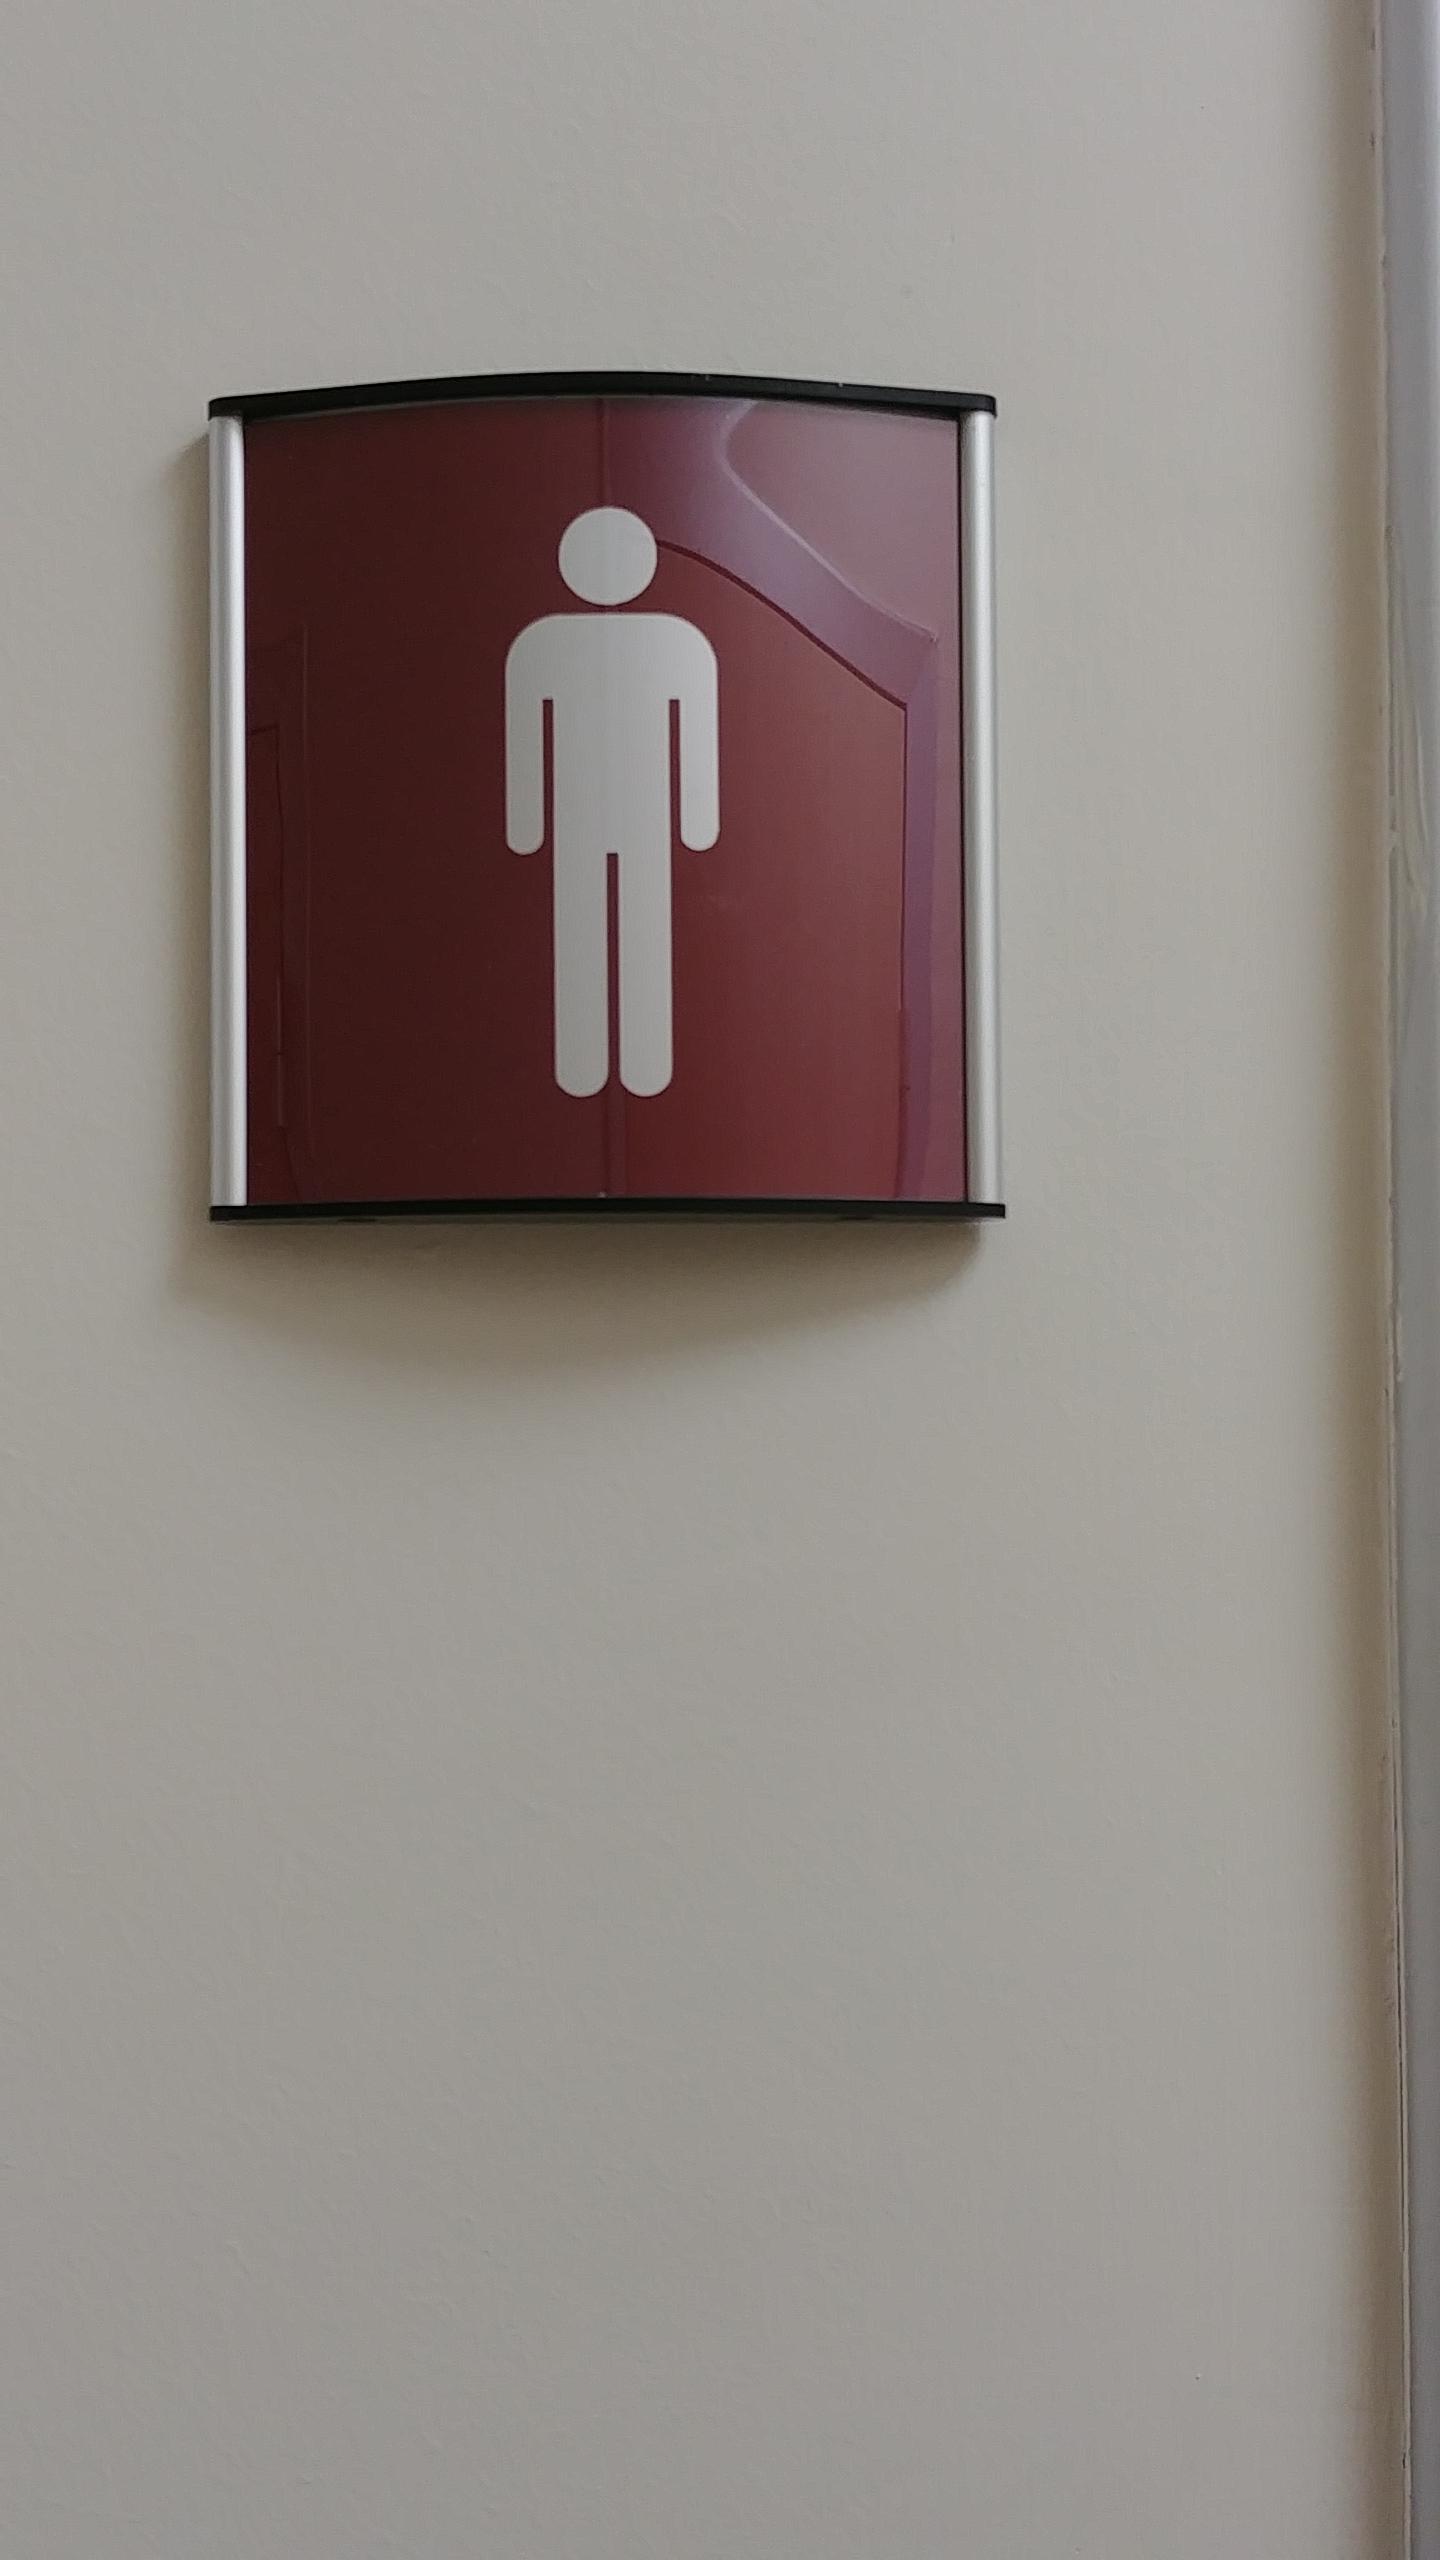 15x15 cm WC